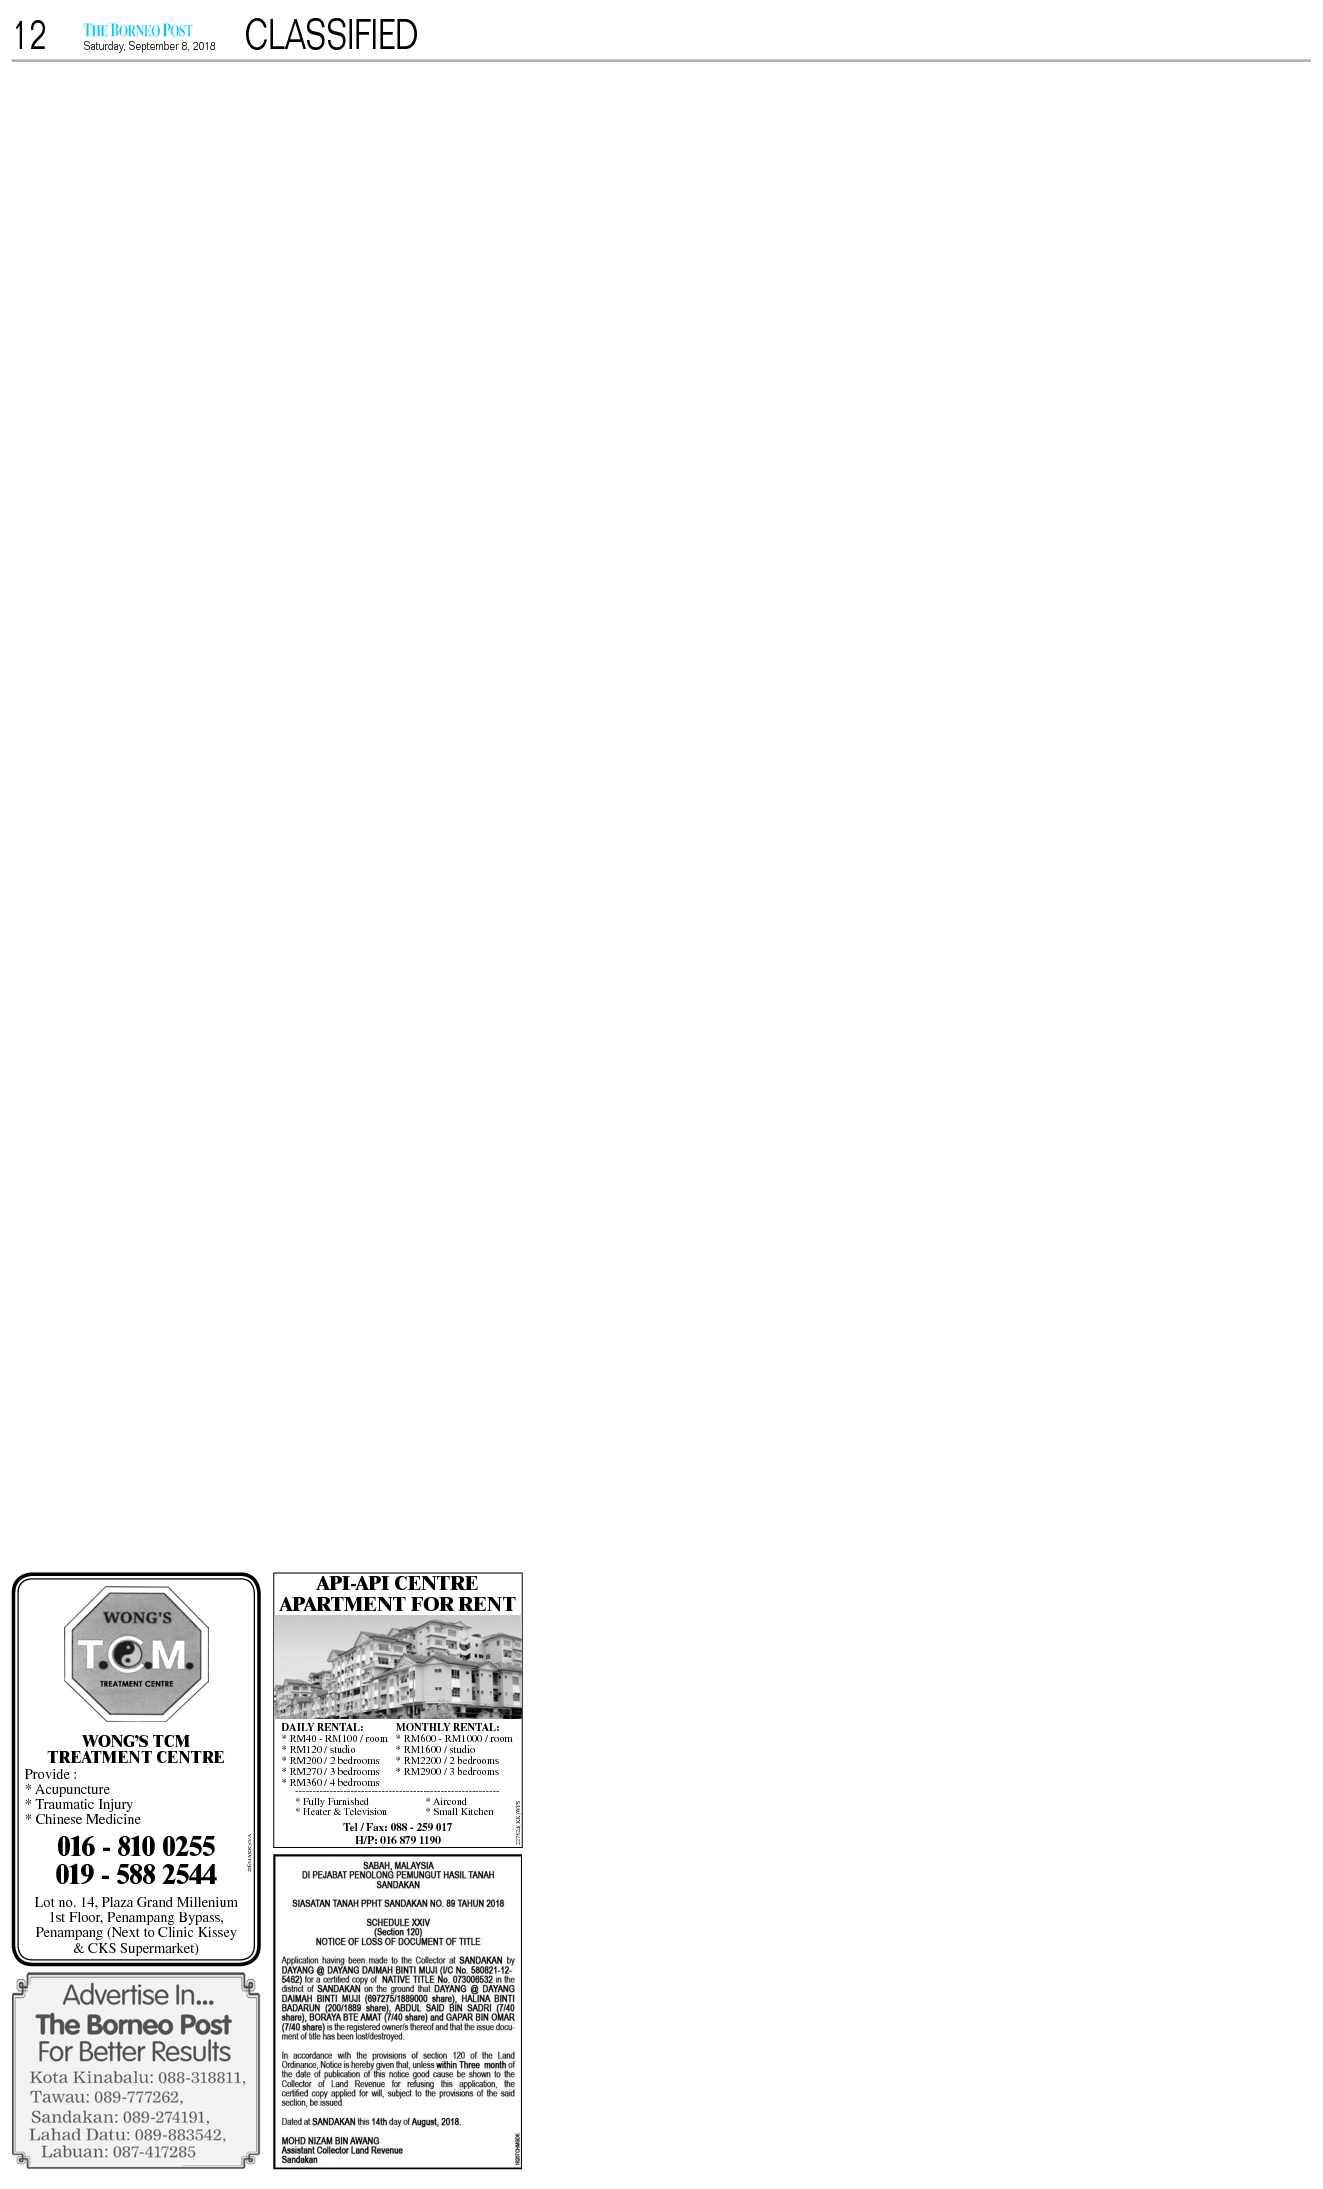 Saturday - Sep 8 | The Borneo Post Classifieds